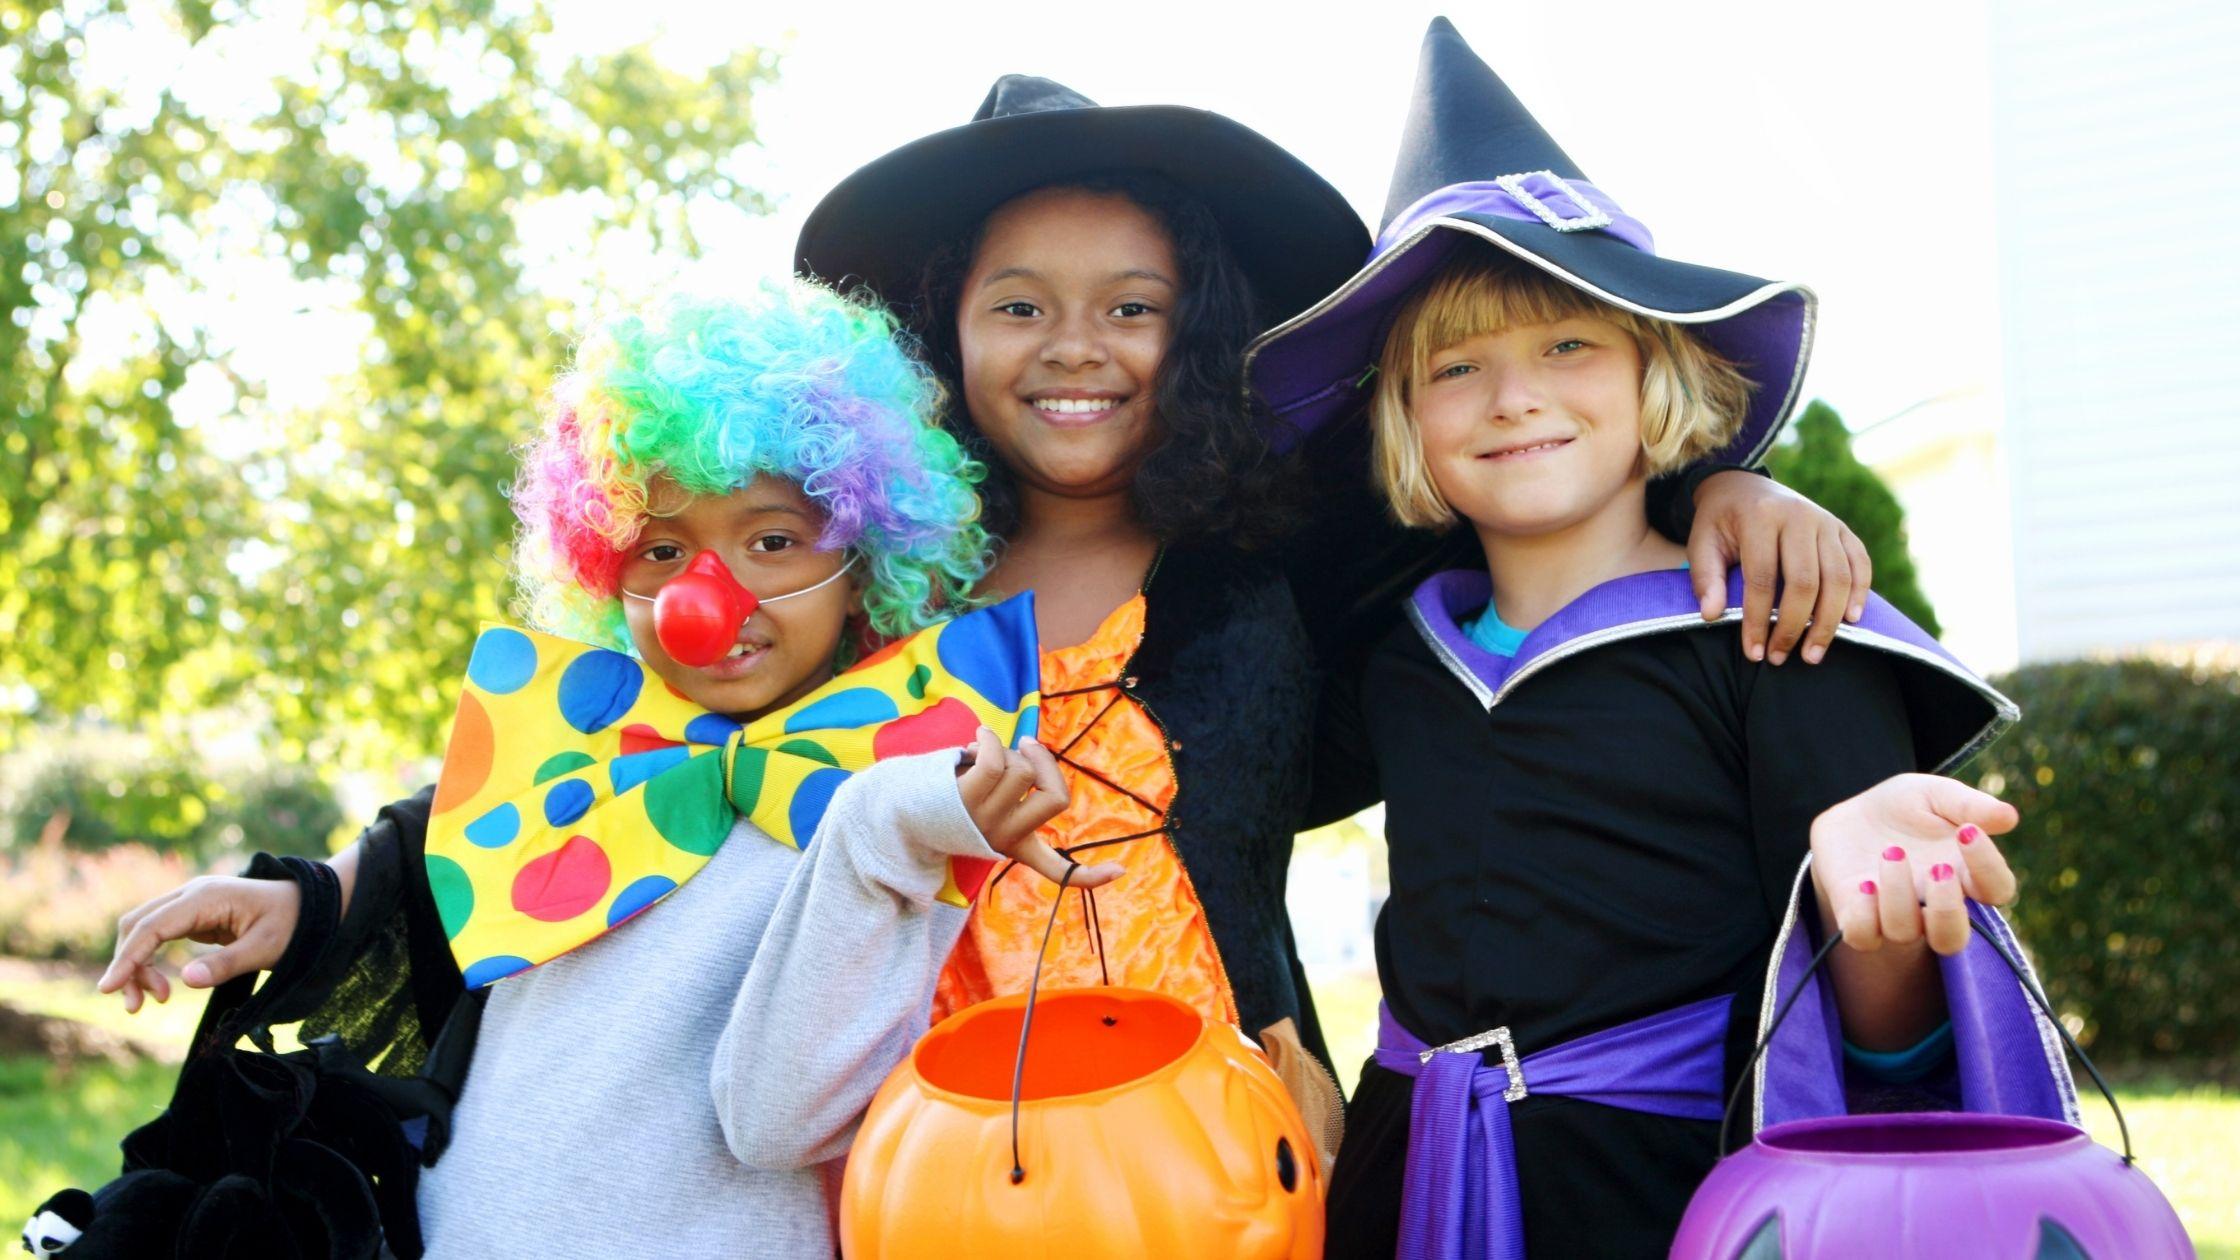 Halloween Activities 2020 Near Me Buffalo Ny Halloween Events in Buffalo for Kids – 2020 Edition | Fun 4 Kids